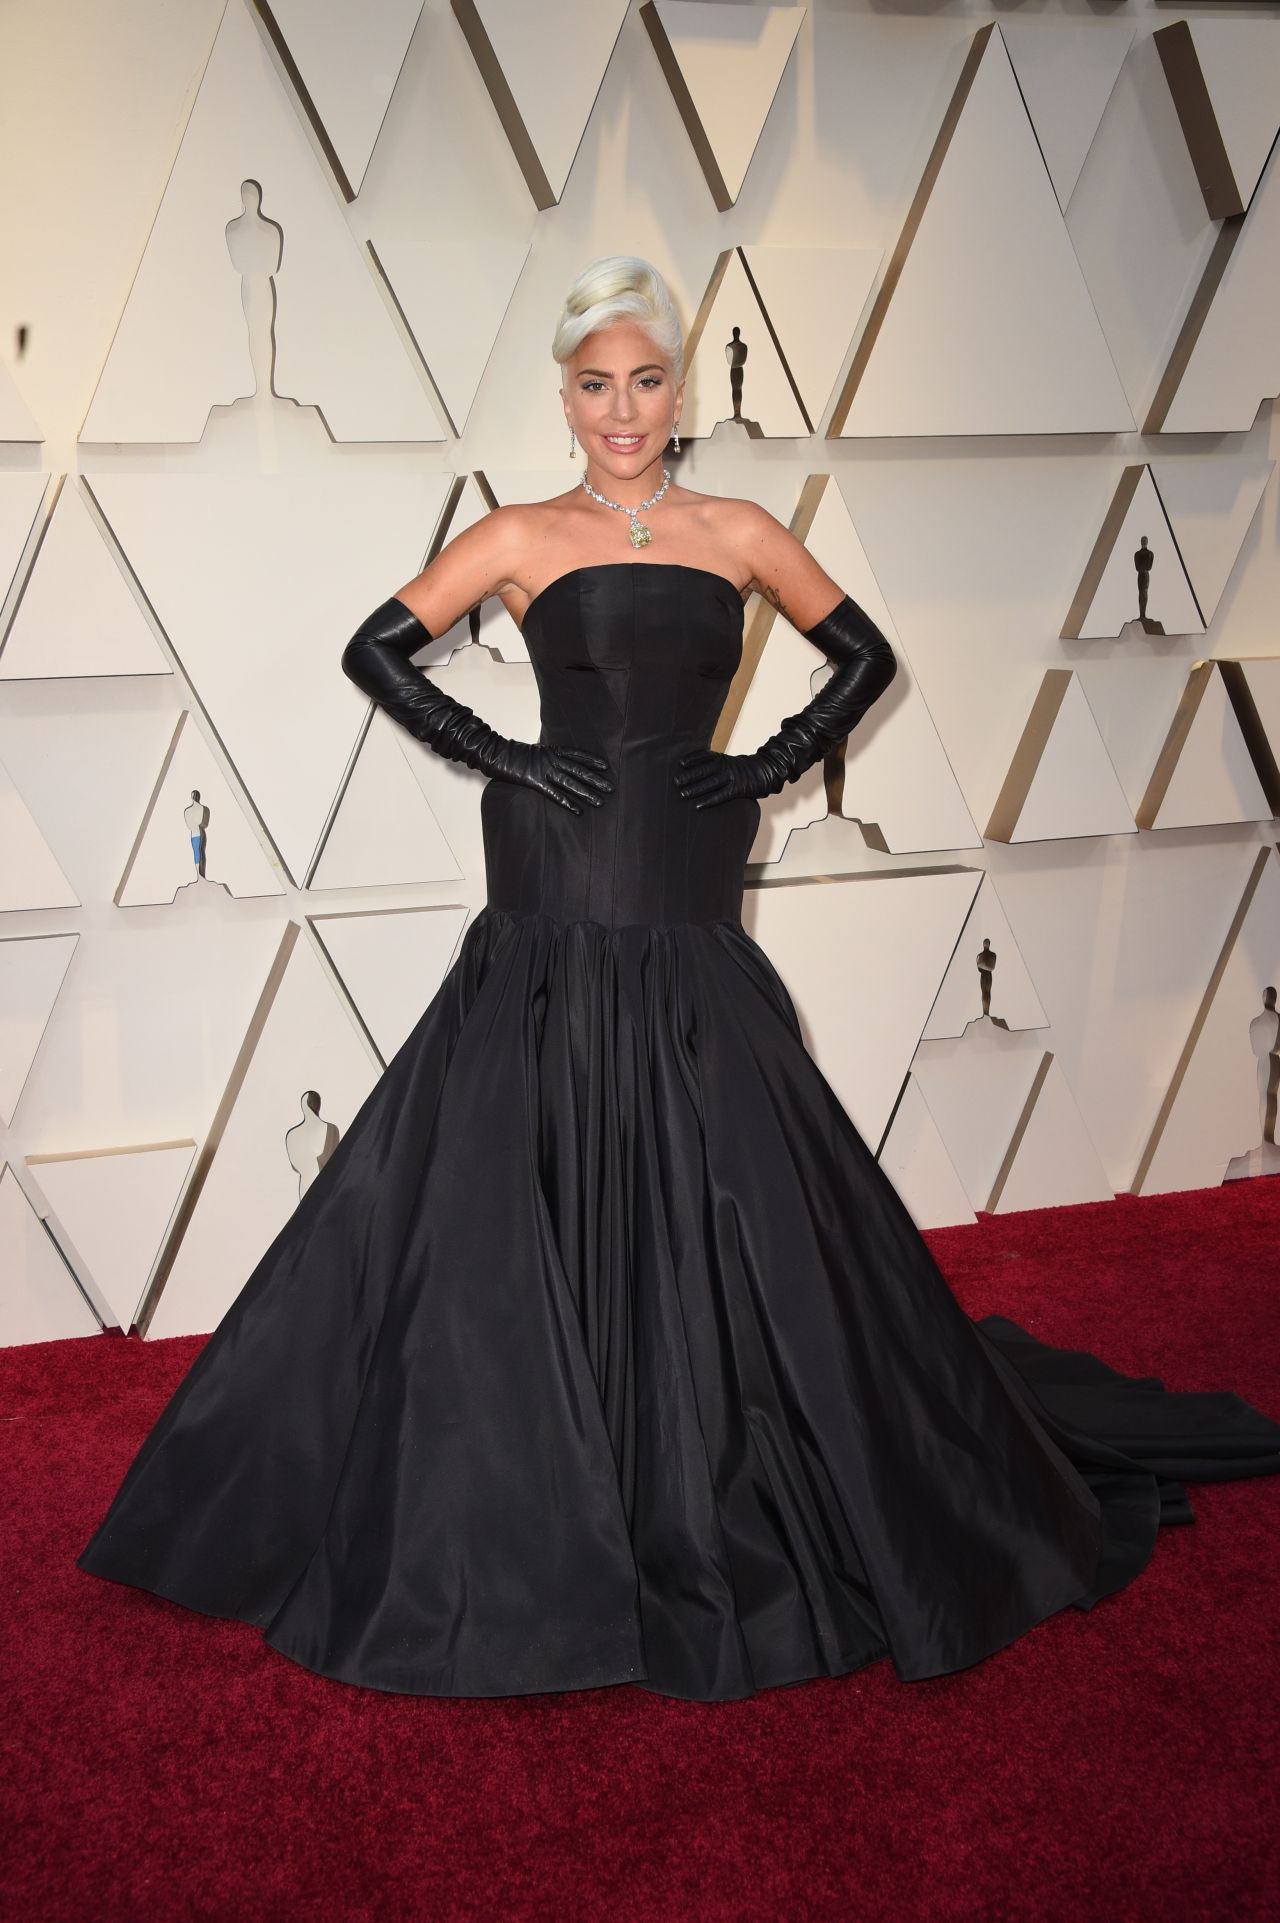 Lady gaga oscars 2019 red carpet - Oscars red carpet online ...